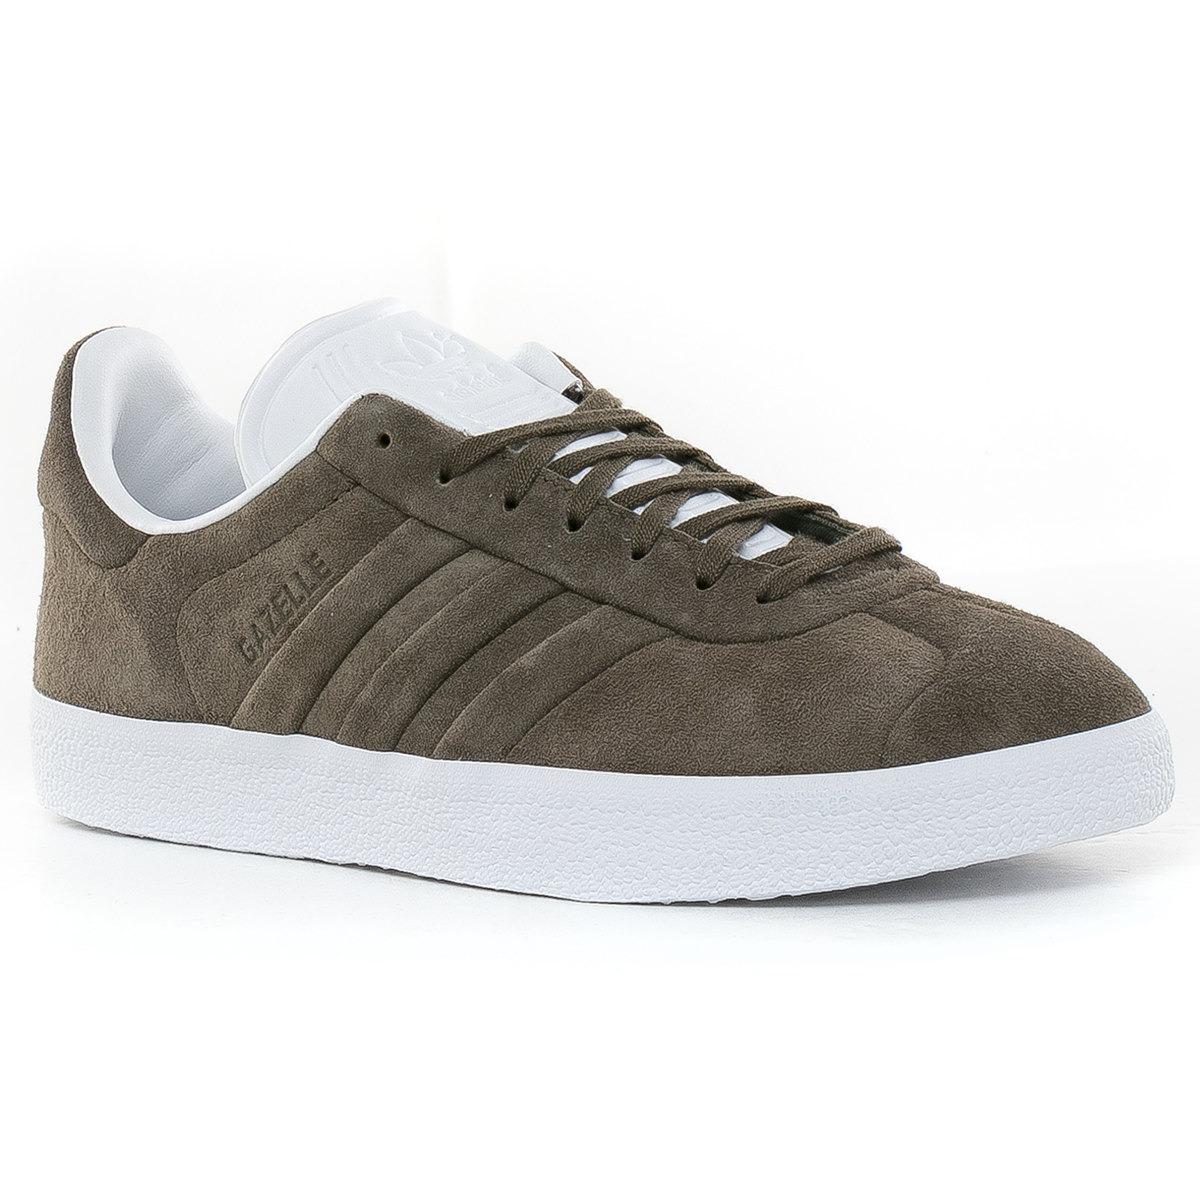 cheap for discount 9c87e 25a69 zapatillas gazelle stitch and turn adidas originals. Cargando zoom.